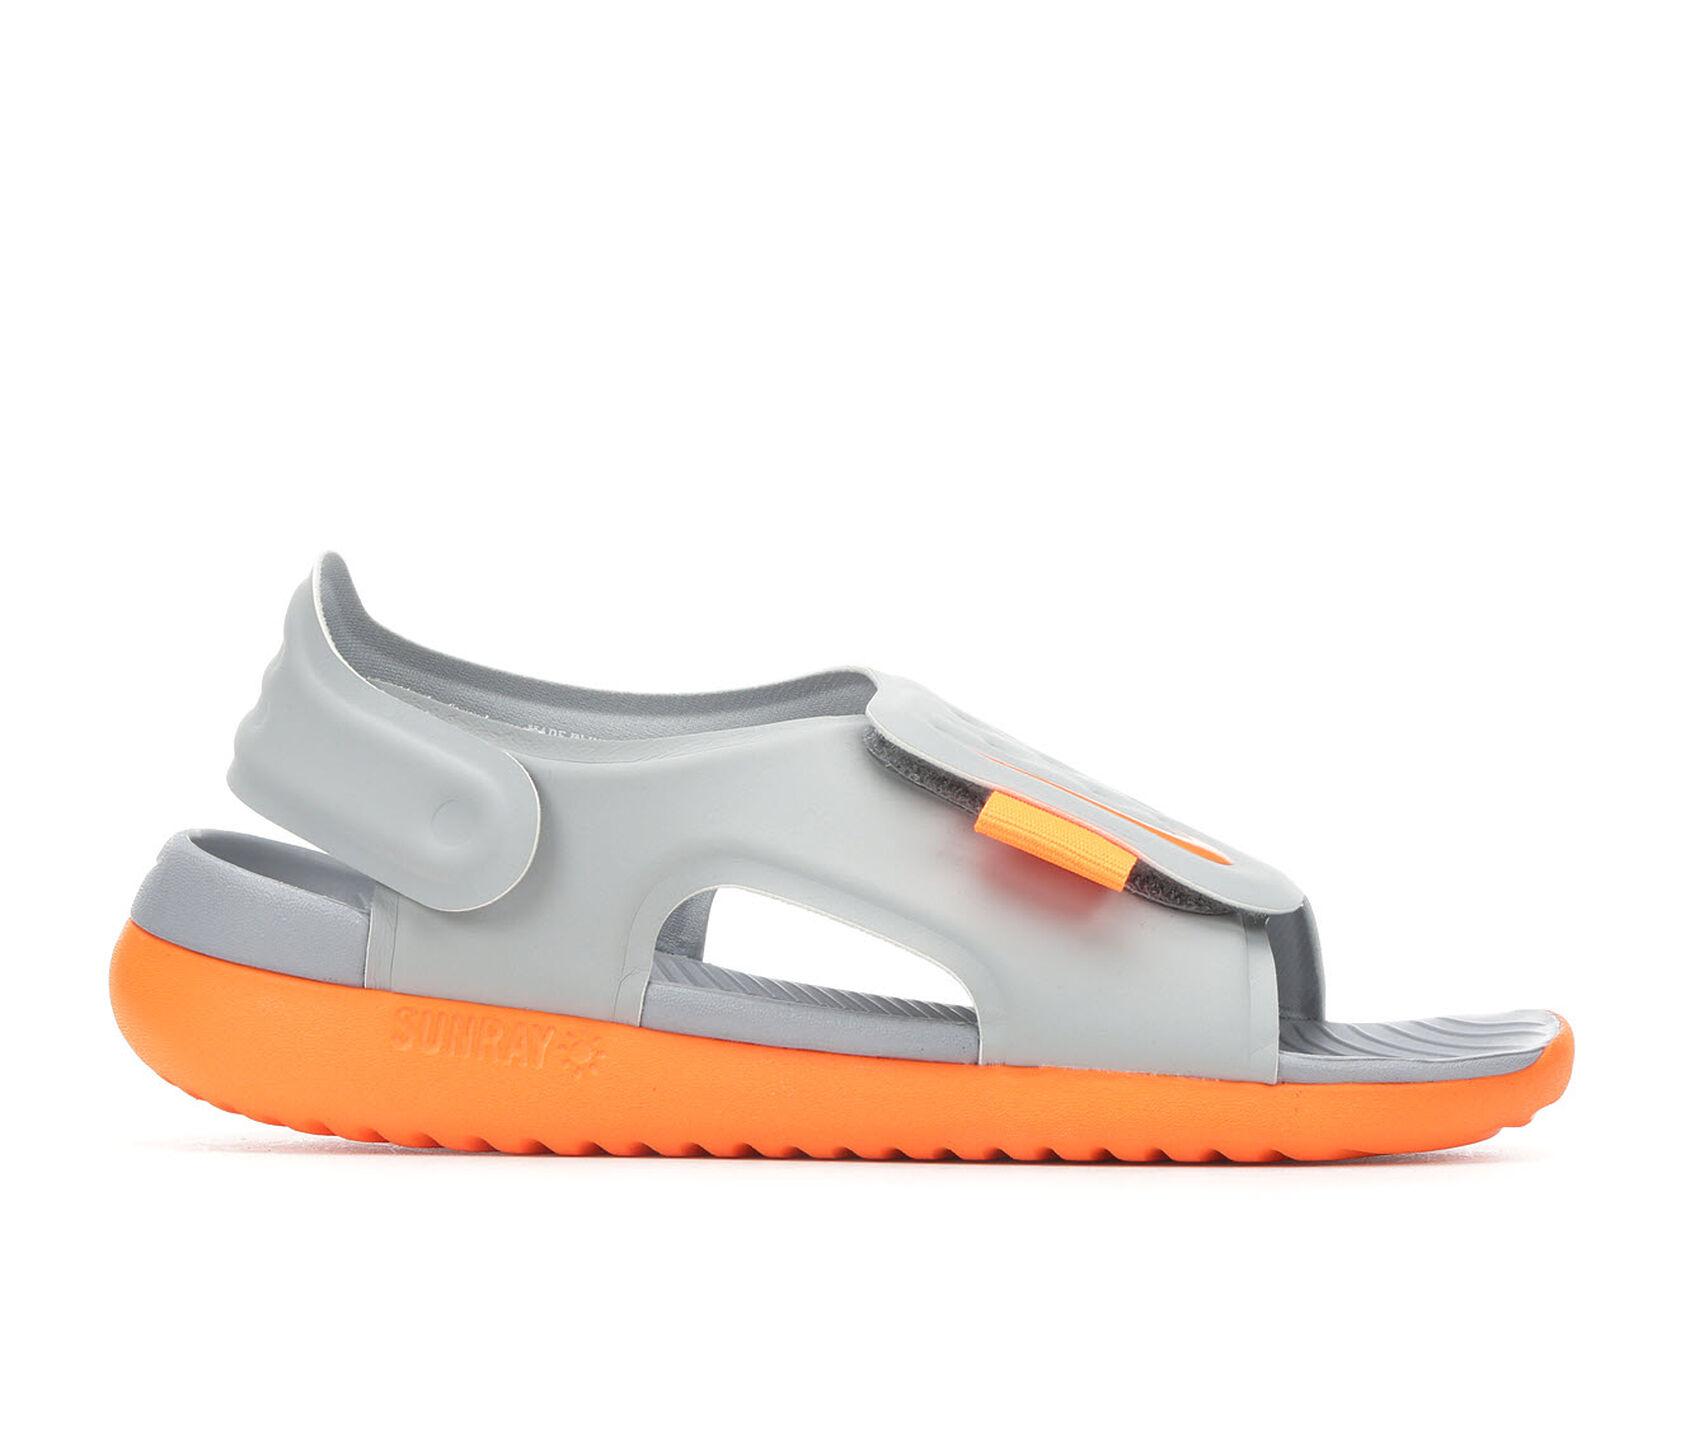 8ba01ae8a75d ... Nike Little Kid  amp  Big Kid Sunray Adj 5 Sandals. Previous